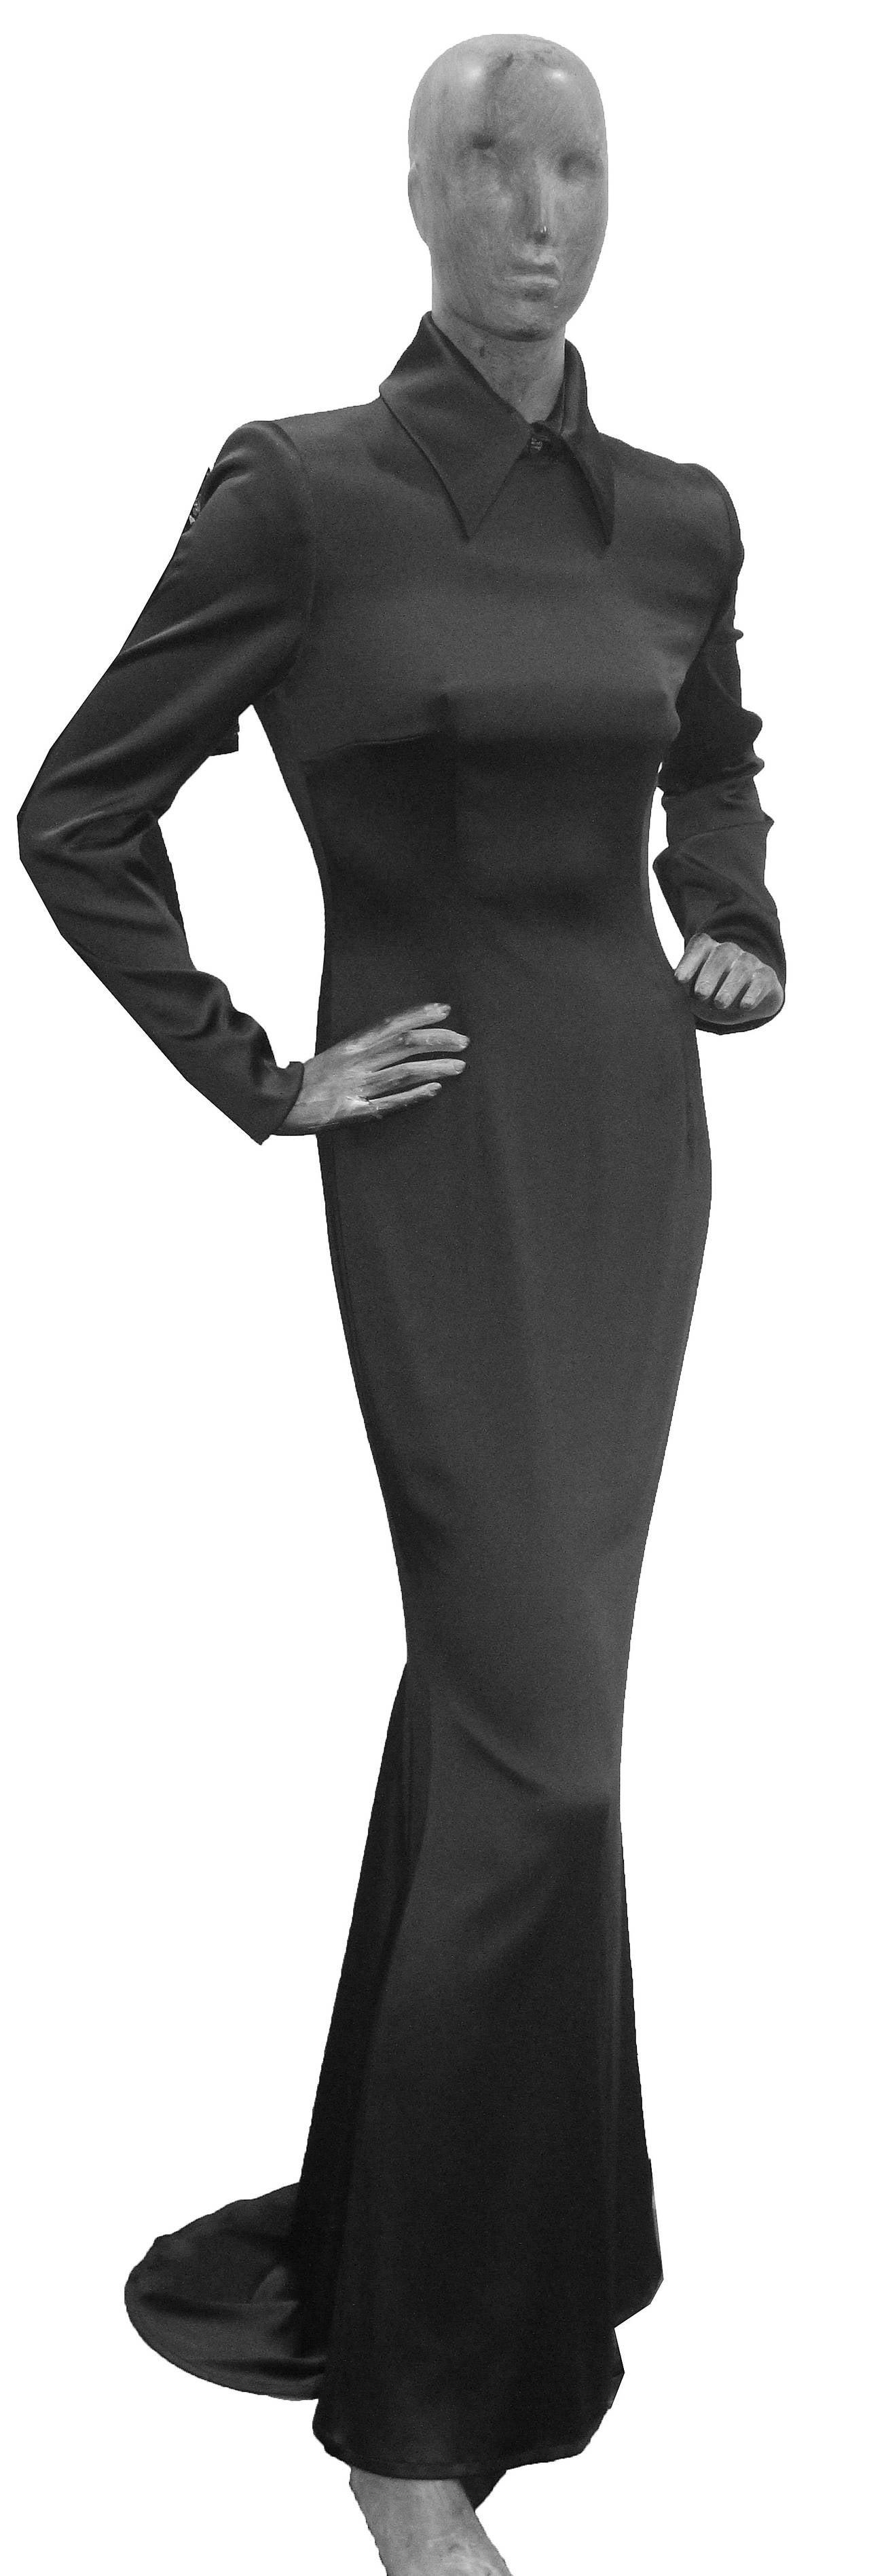 1990s Givenchy by Alexander McQueen Black Silk Evening Dress (Unworn) 2